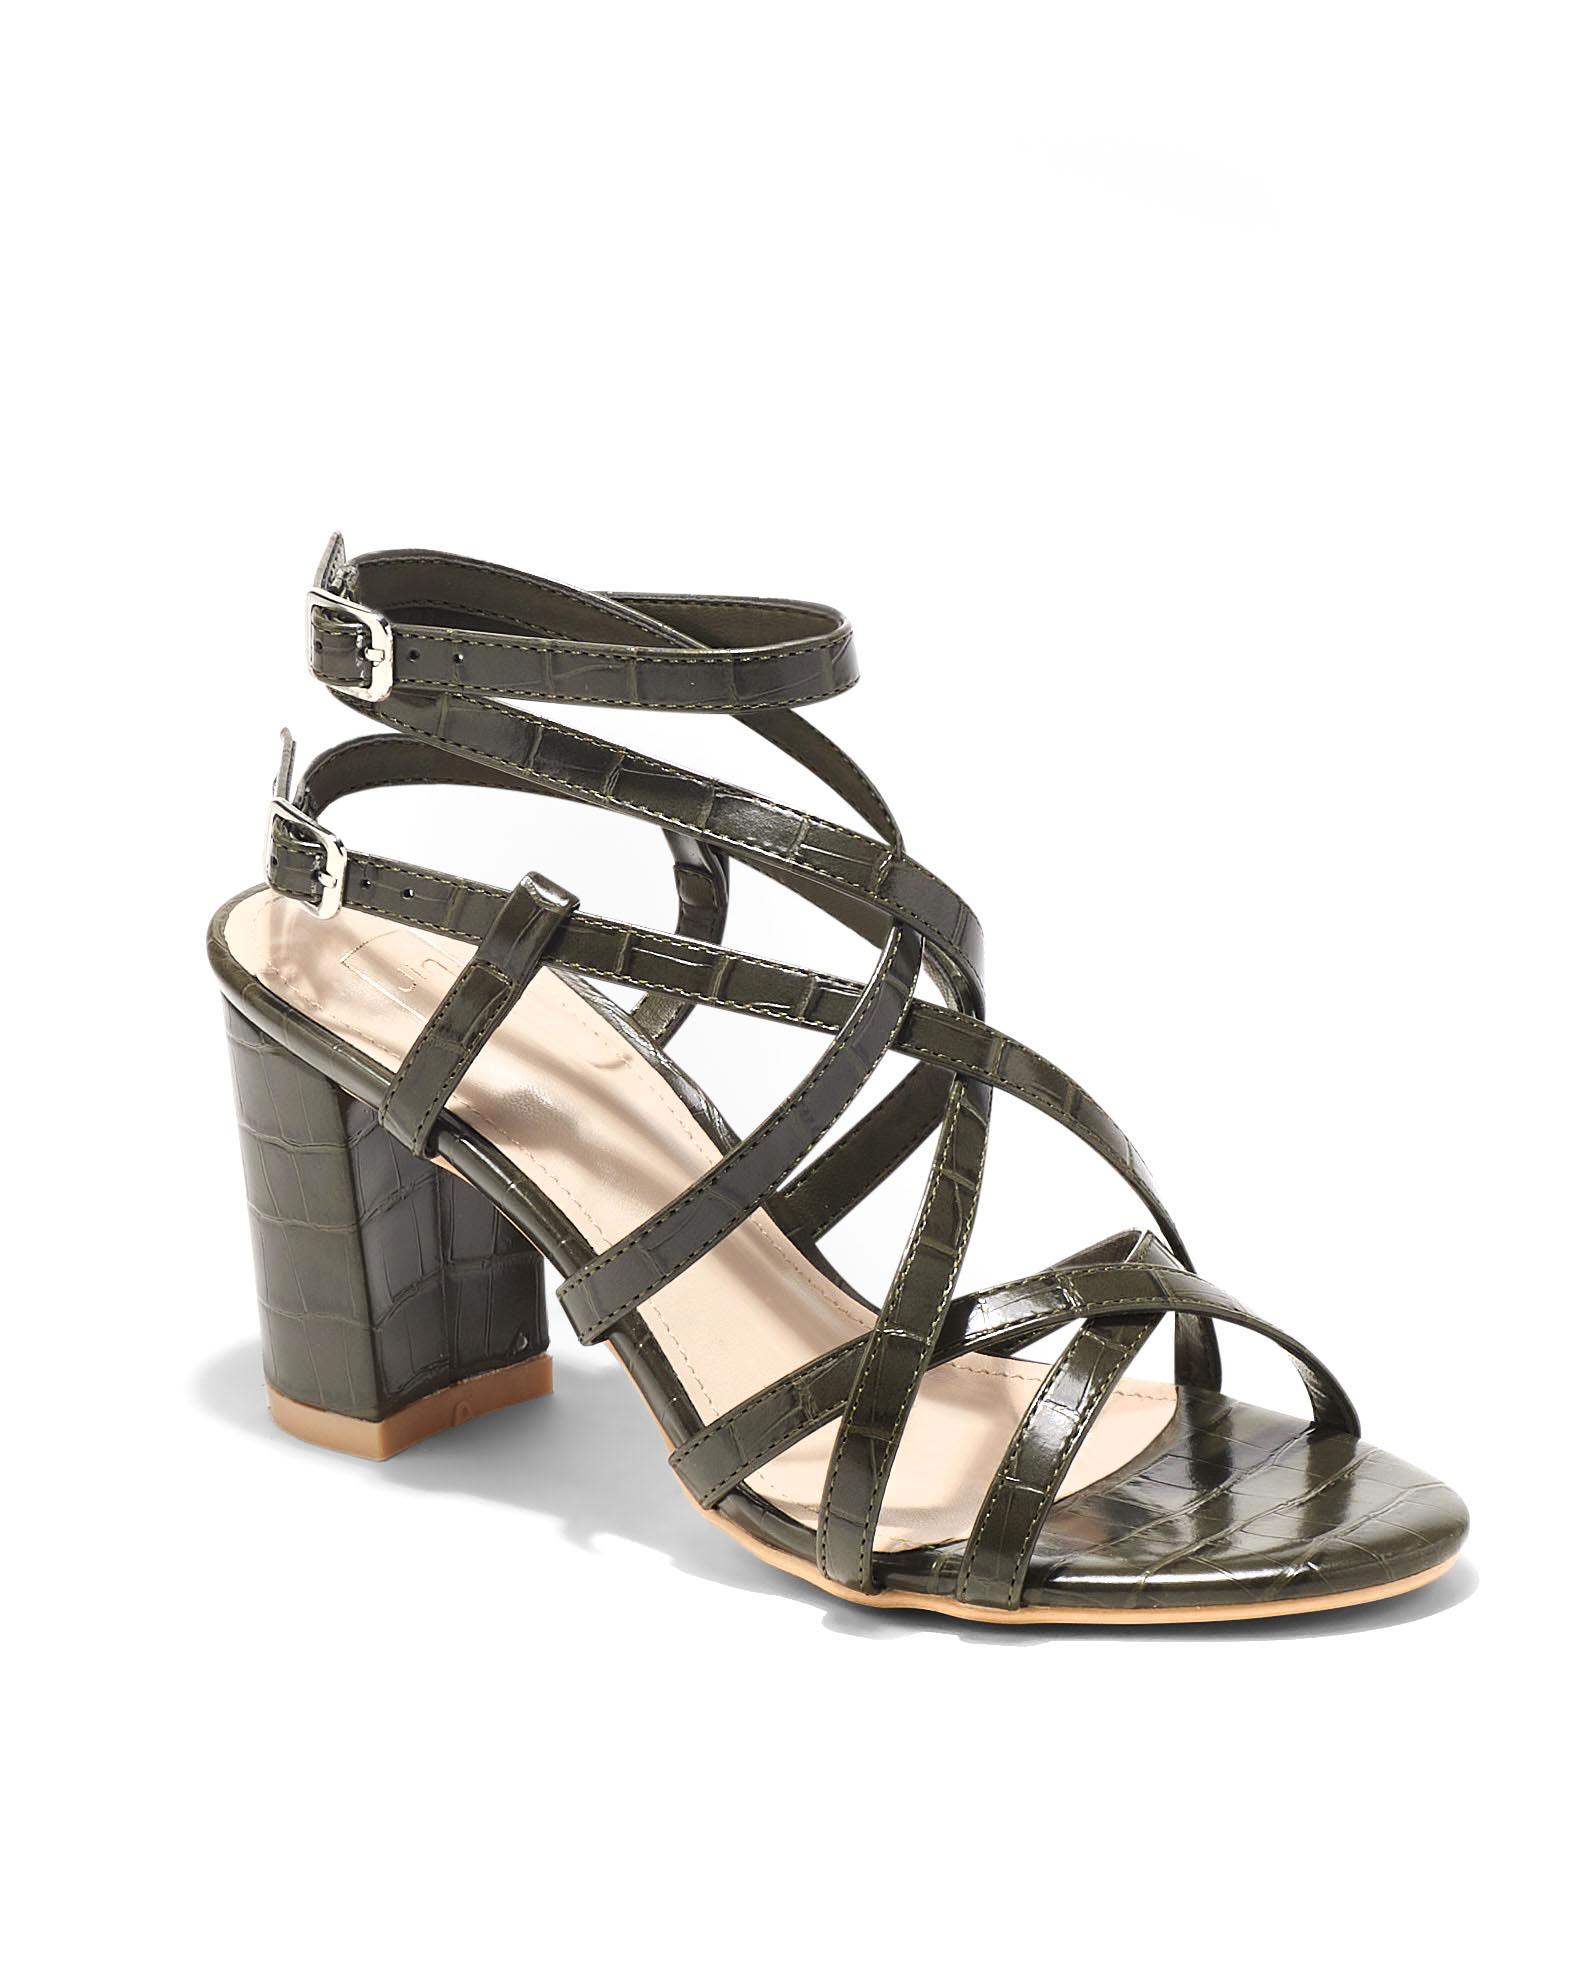 Sandales À Talons Femme - Sandale Talon Decrochee Croco Olive Jina - W-88956-62a